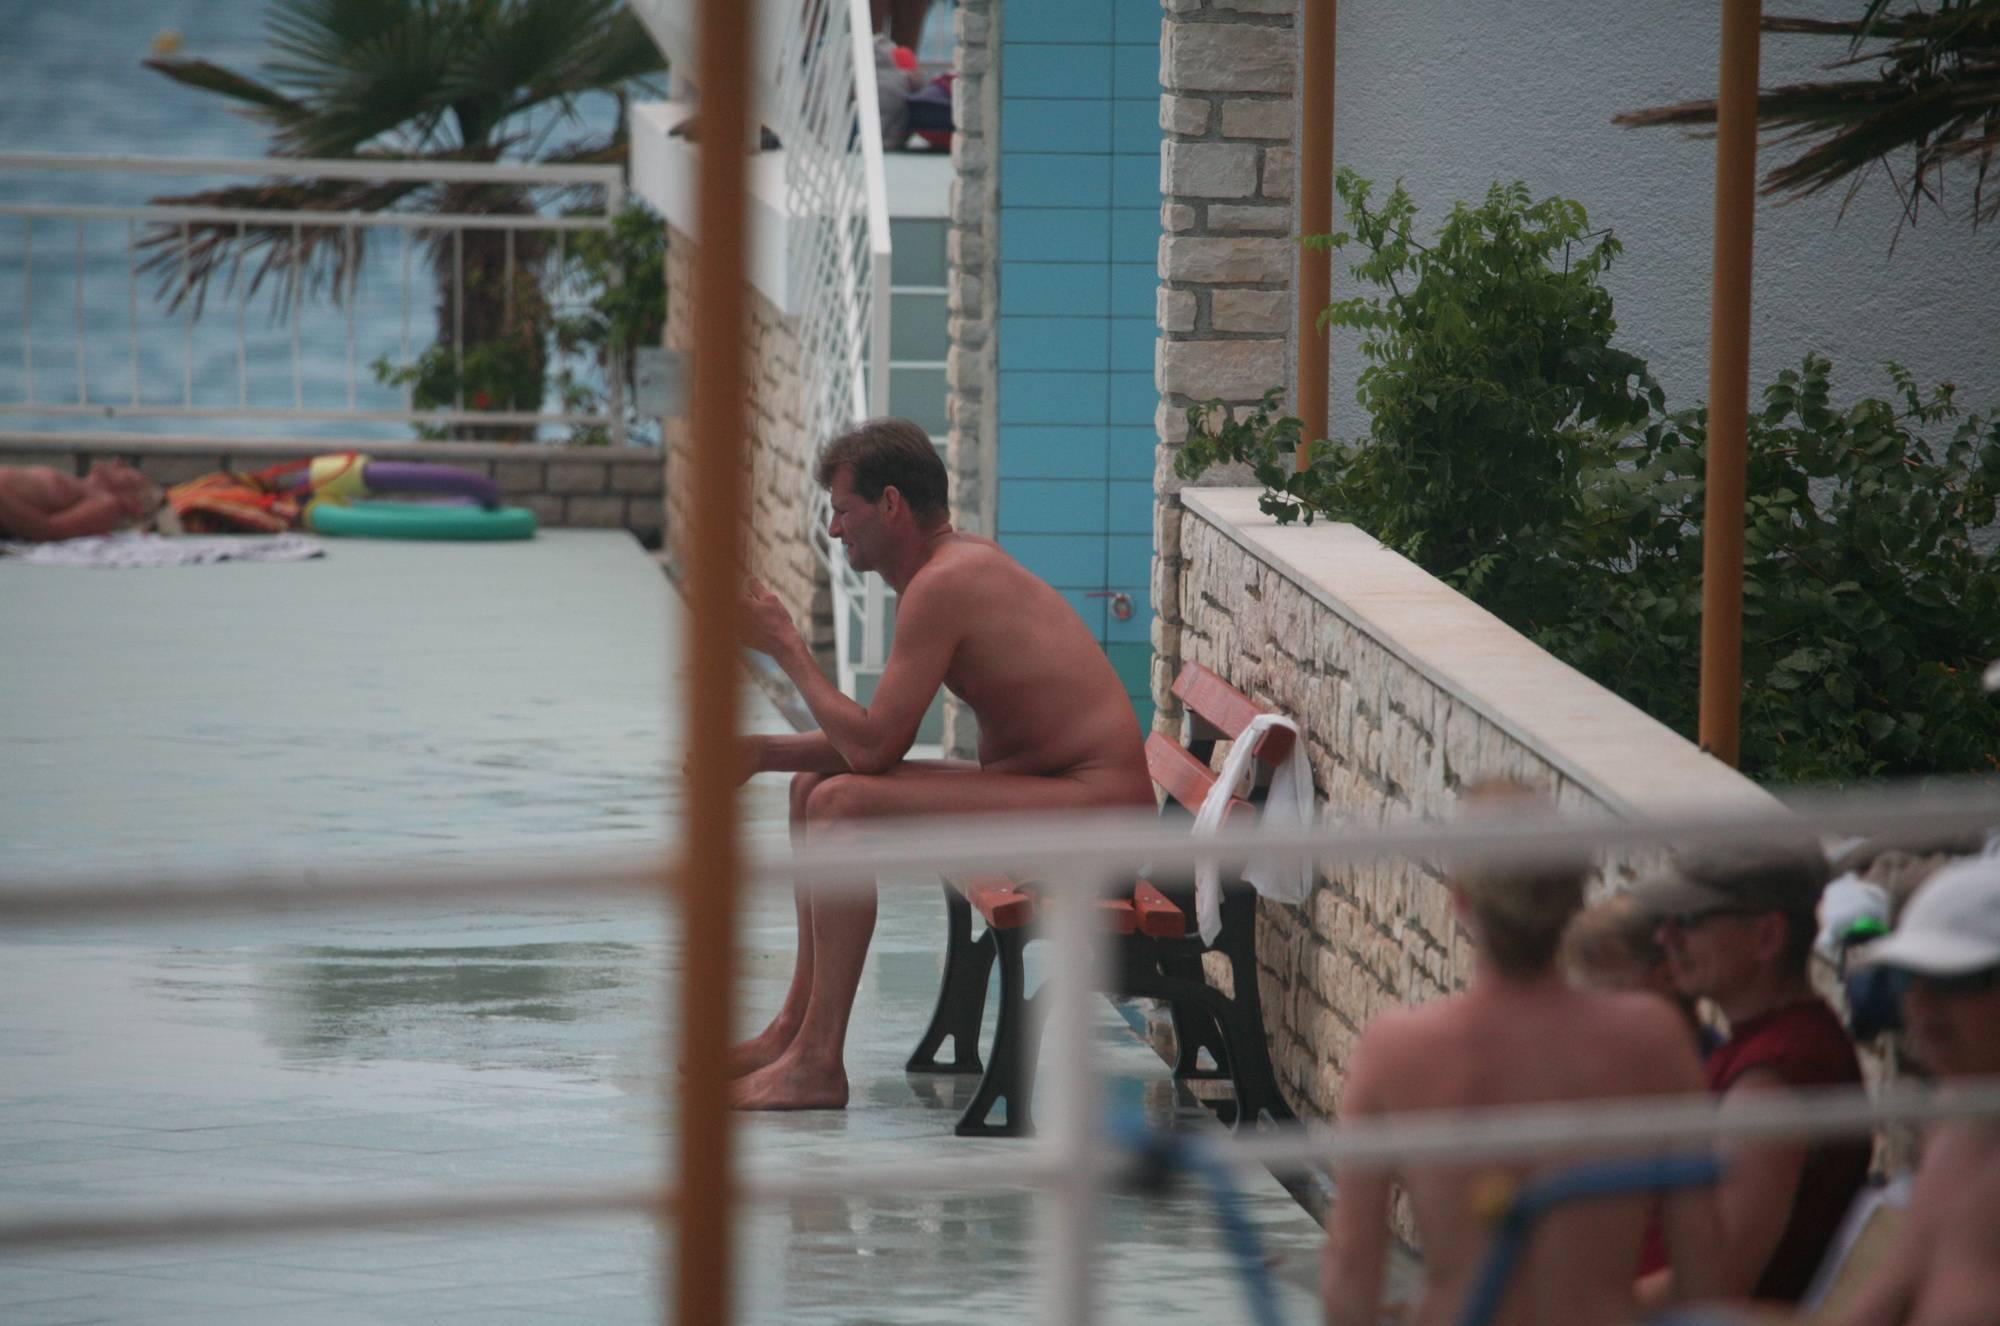 Pure Nudism Photos-Nuda Inner Pool Activities - 4